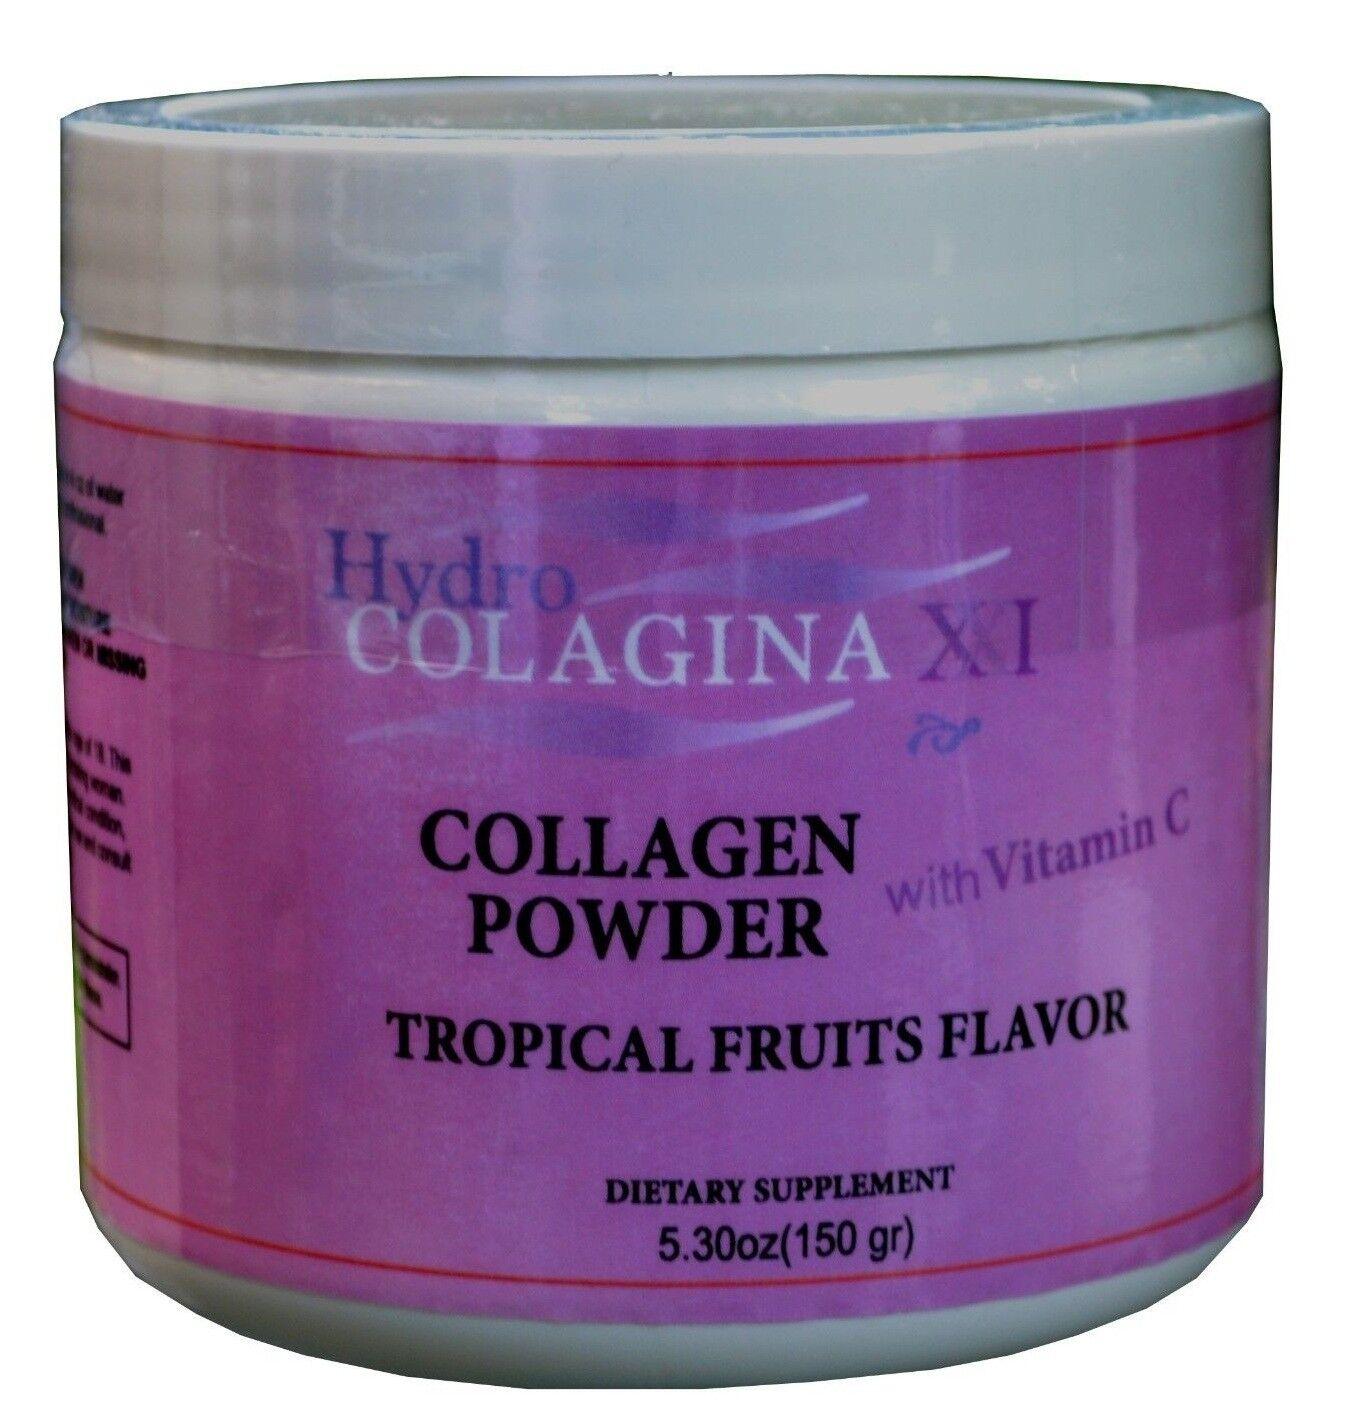 HYDRO COLAGINA XXI hidro collagen powder vitaminC colageina 10 colagina 21